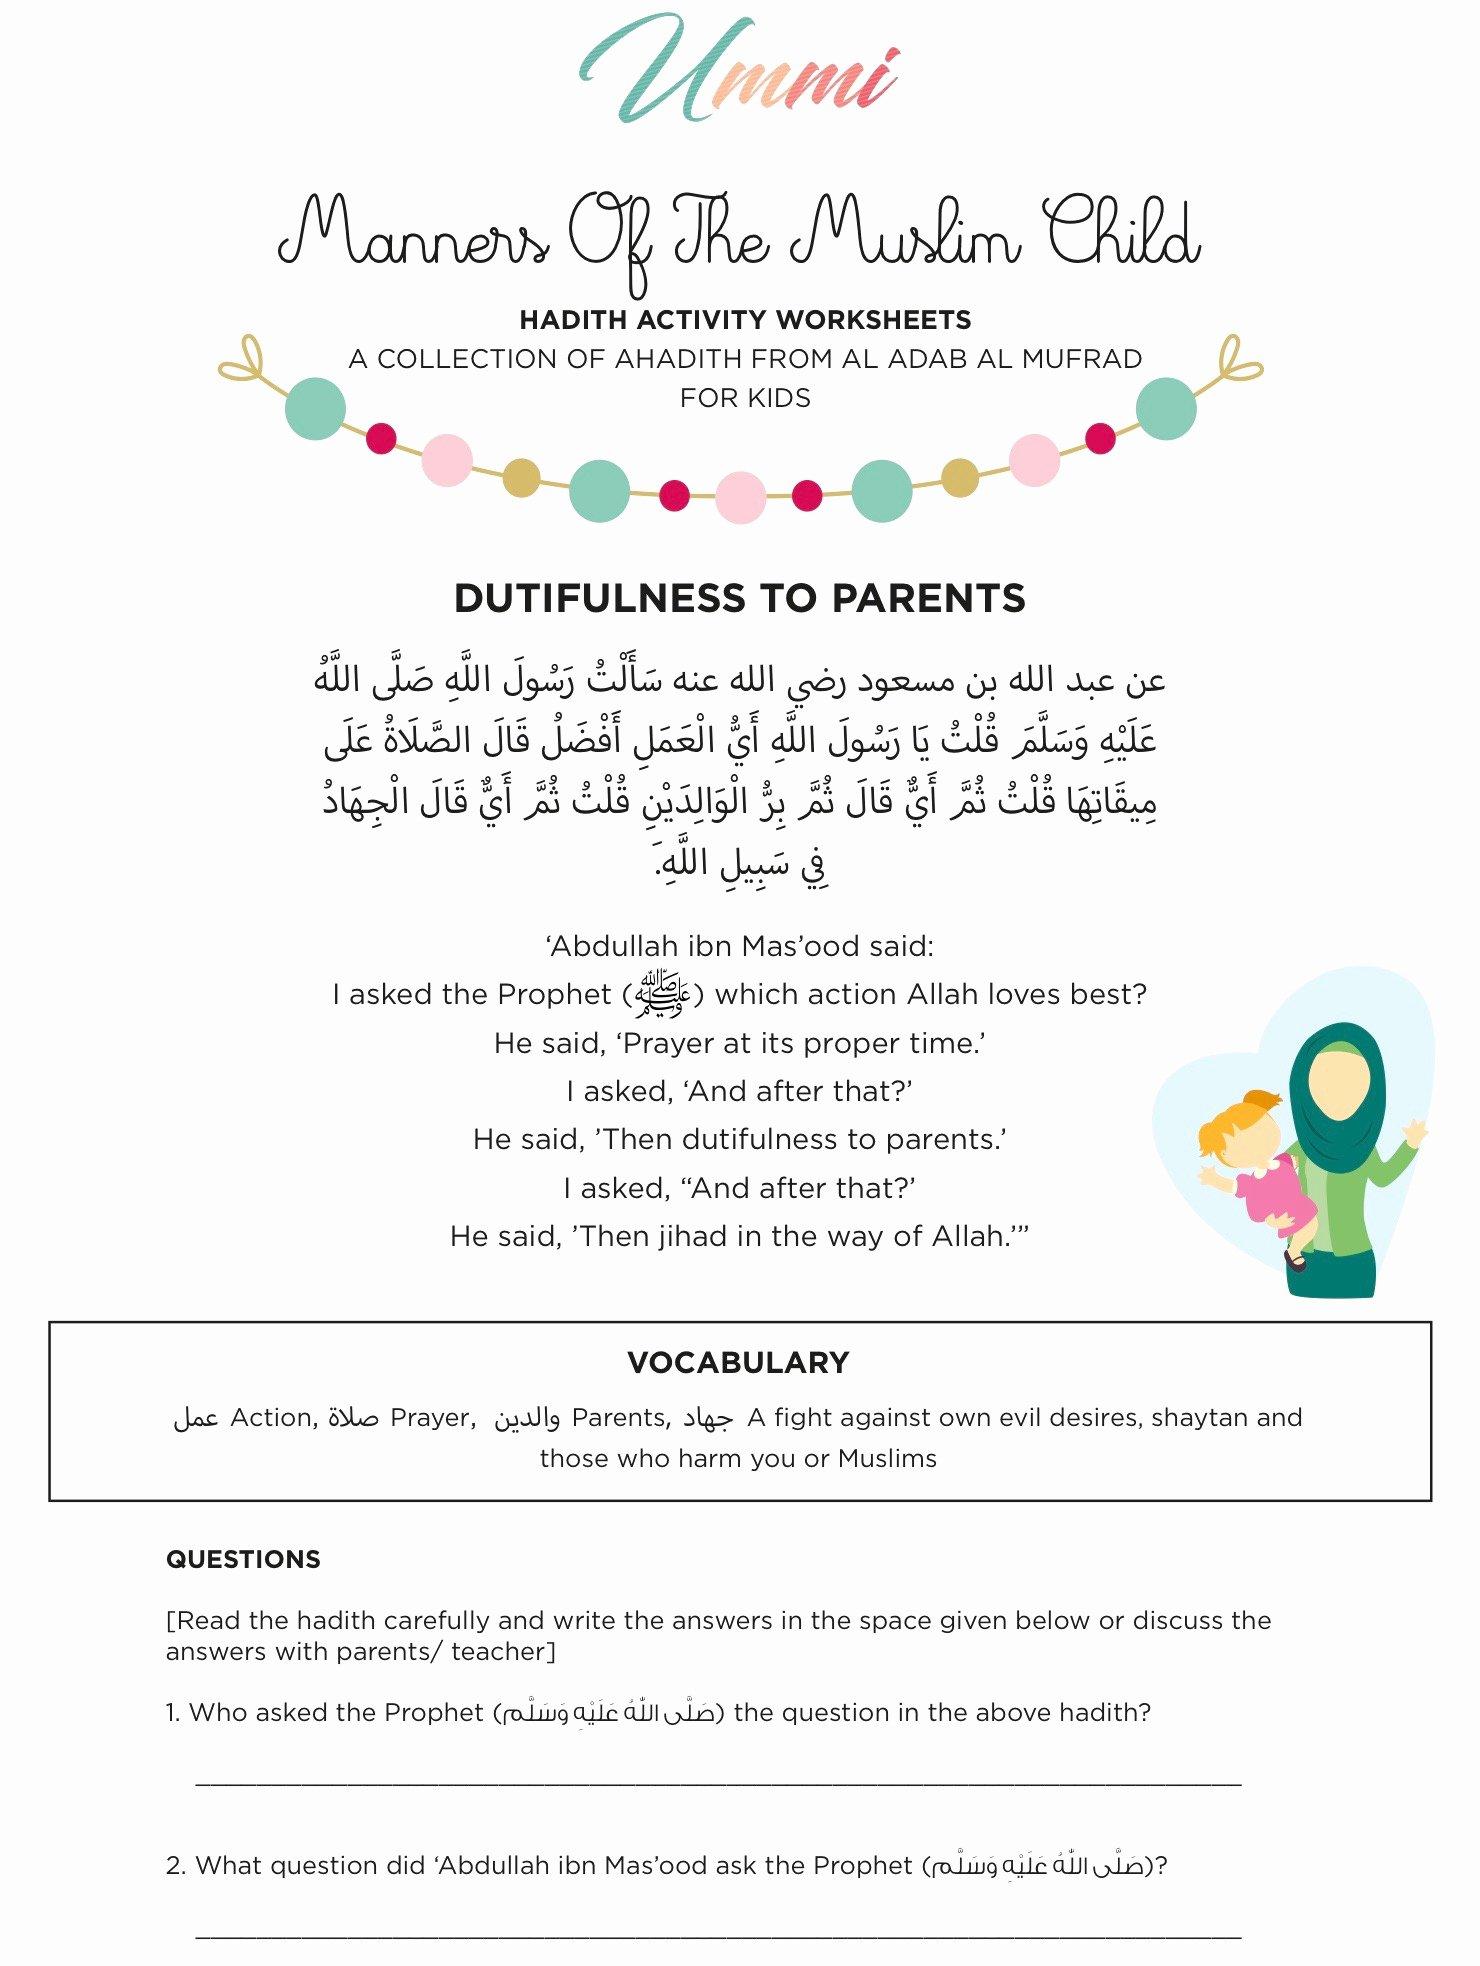 Islamic Worksheets for Preschoolers Beautiful Hadith Activity Worksheets for Kids – Ummi – islamic